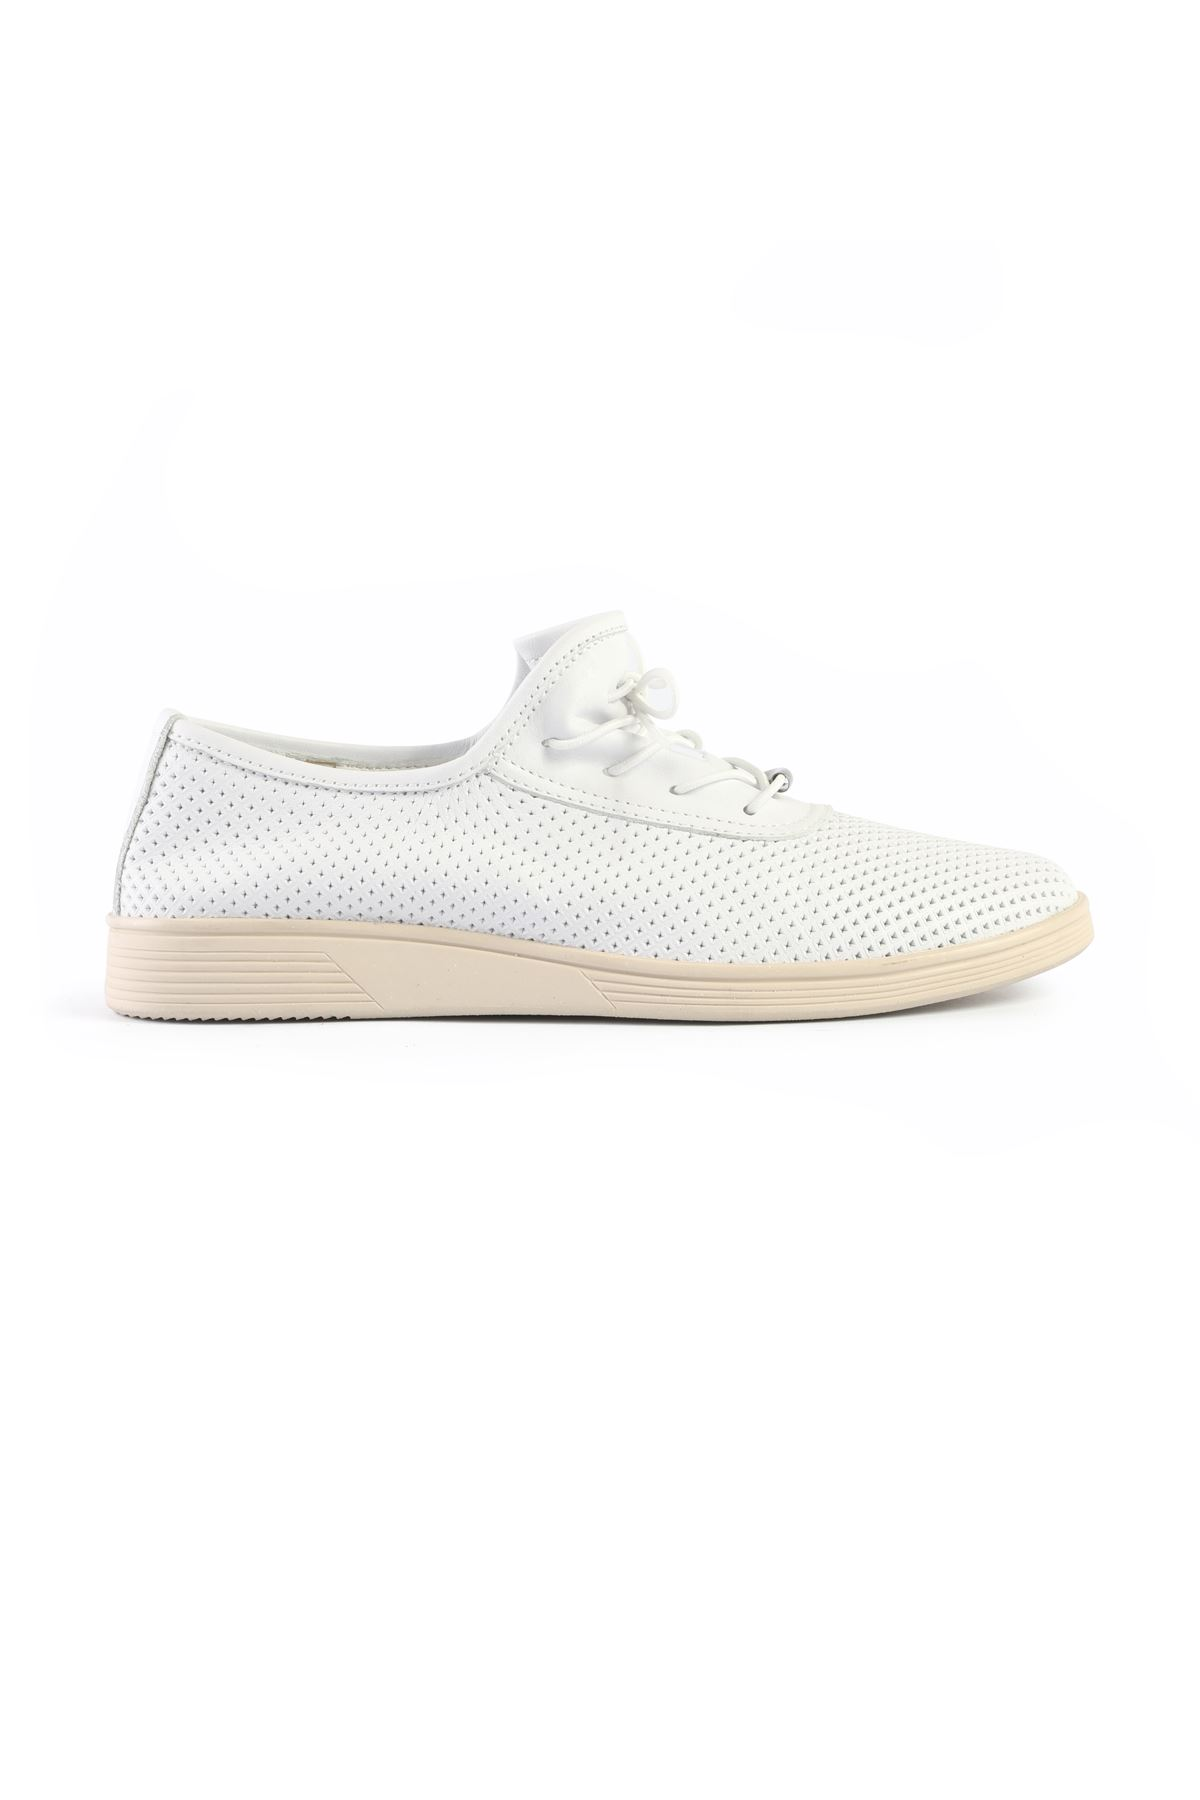 Libero FMS203 White Sport Shoes